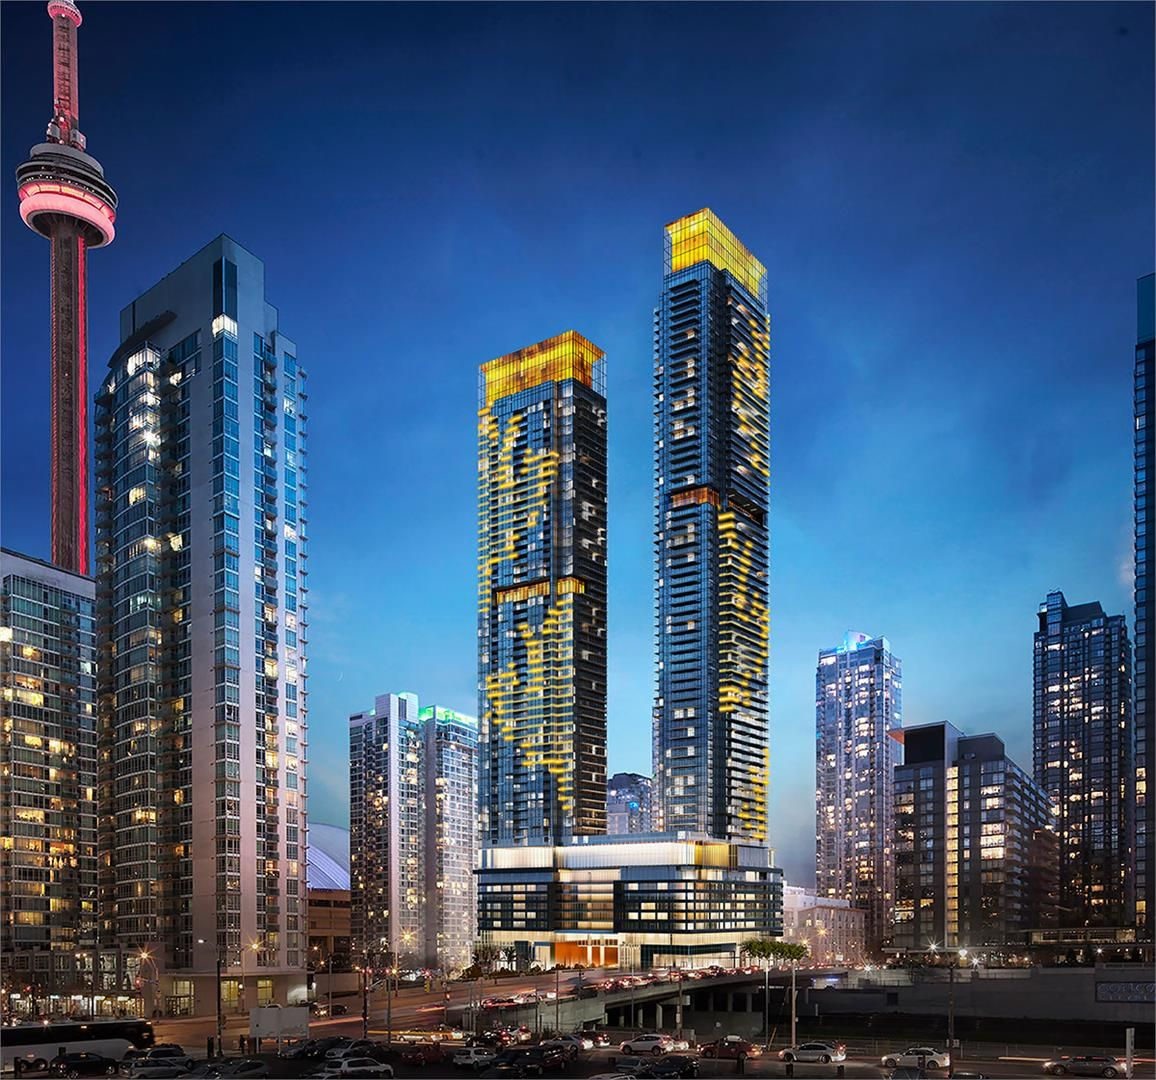 Pre Construction Condos Toronto Condos For Sale Toronto Condos Toronto New Condos Toronto Townhouse Toronto Tower Design Skyscraper Downtown Toronto